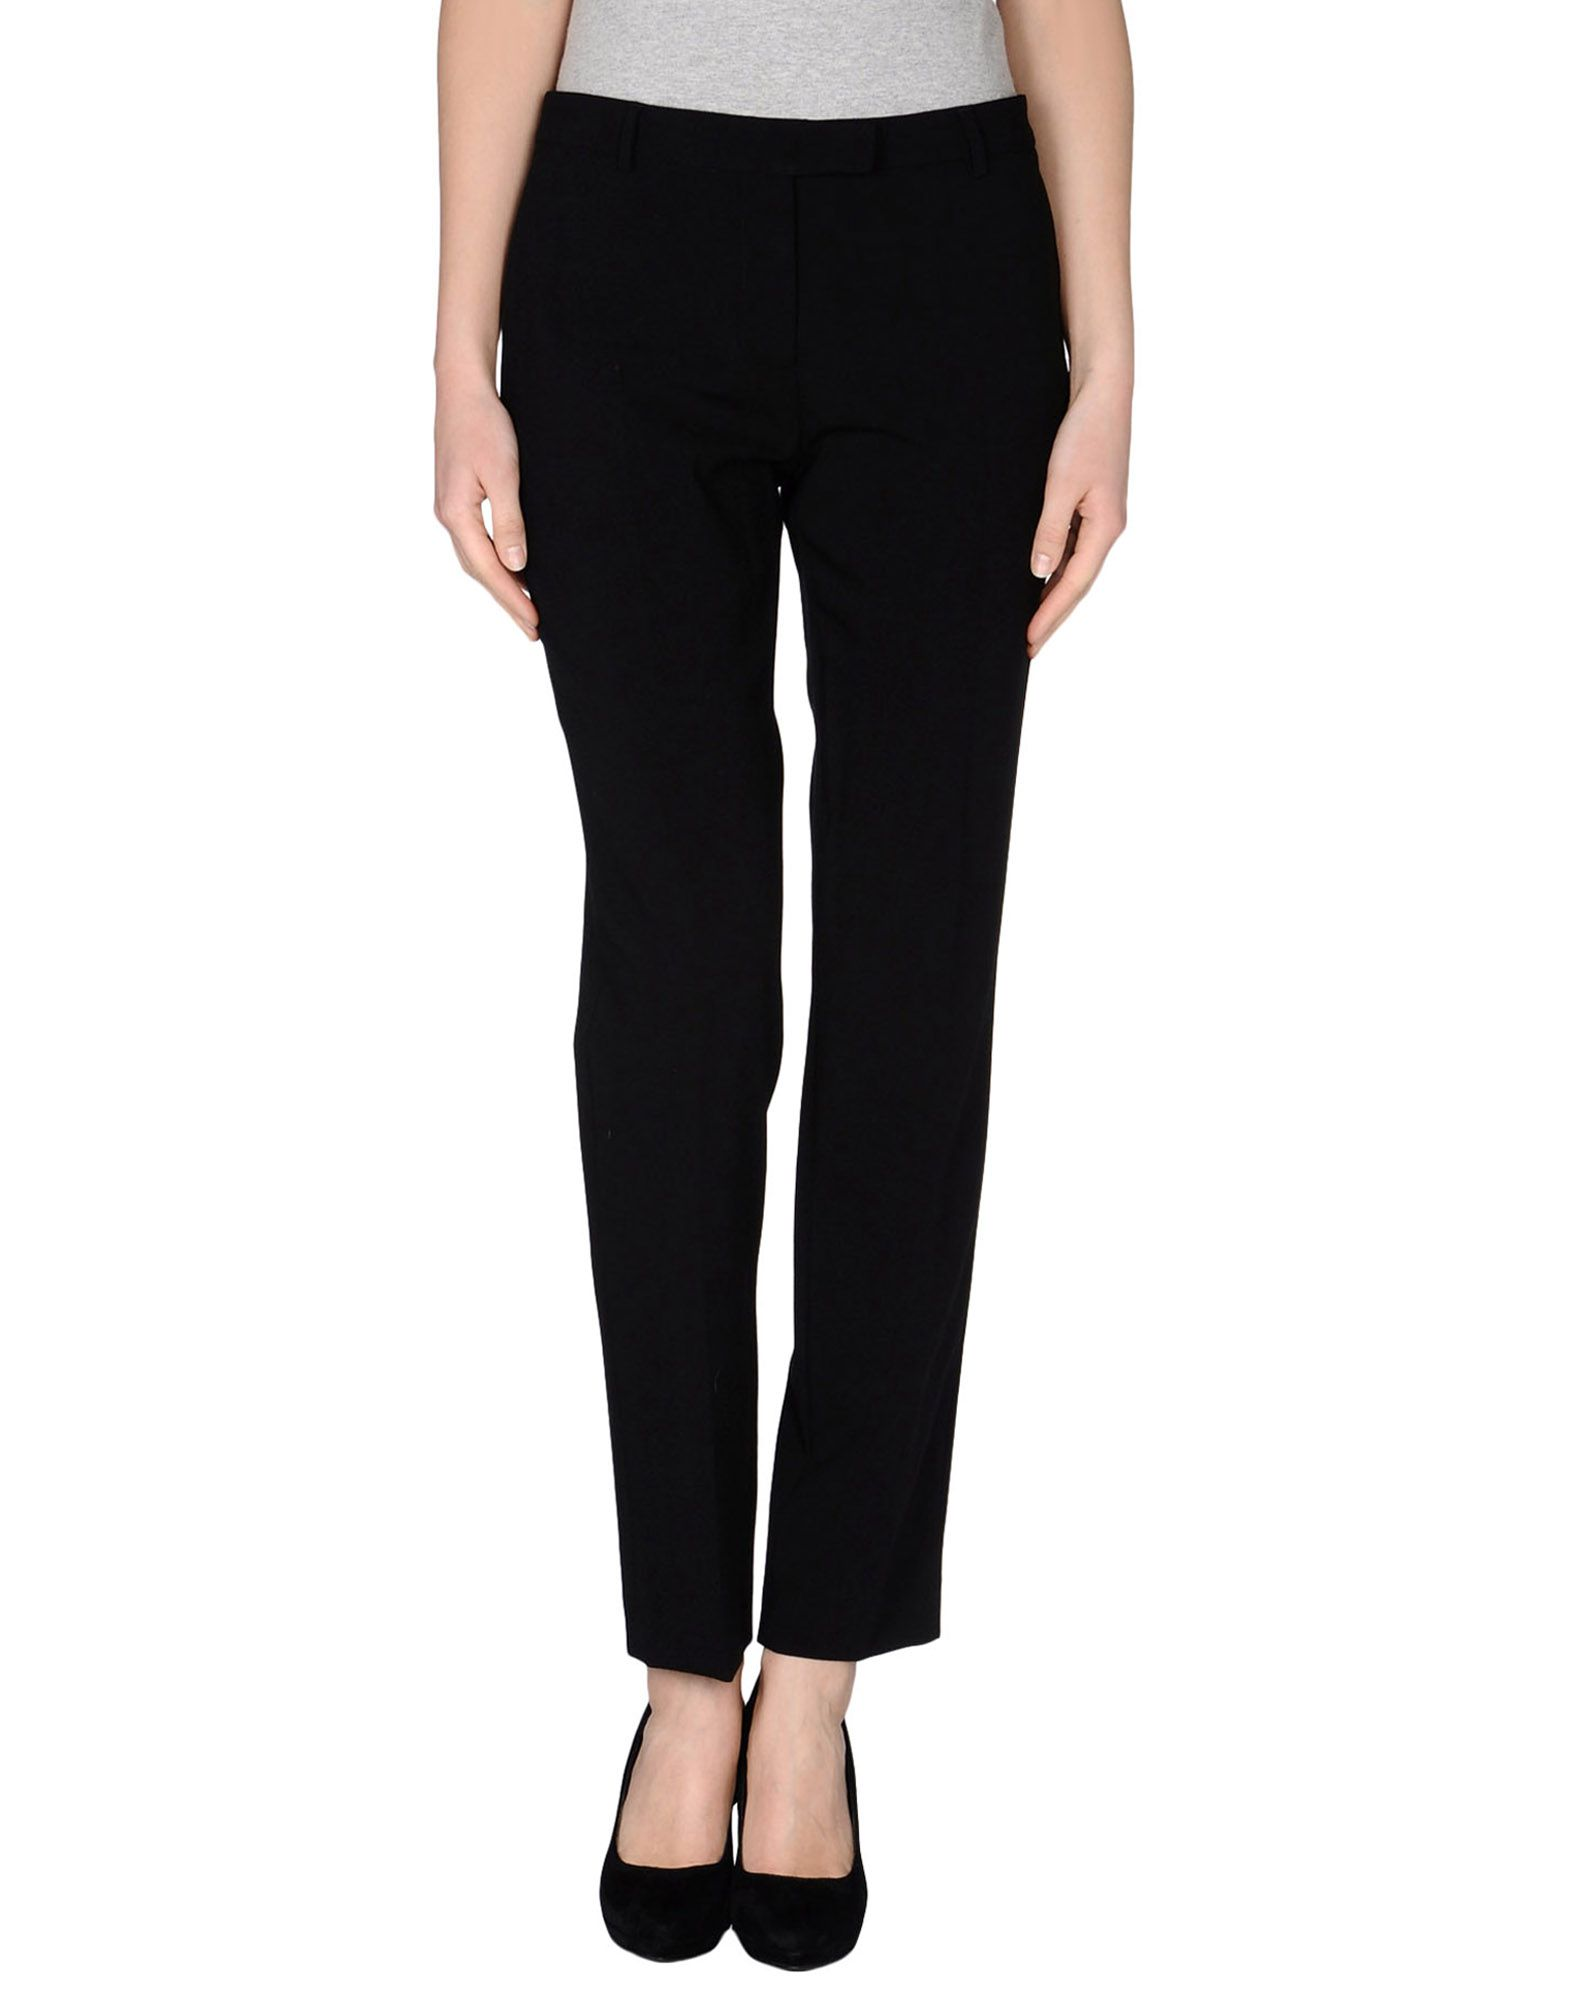 Sep 25, · Excelentes combinaciones con Pantalón negro!!! OUTFITS IDEAS emdesign Todas las tendencias en moda de mujer para combinar tus prendas favoritas con pantalones negros, ideas para mujeres.